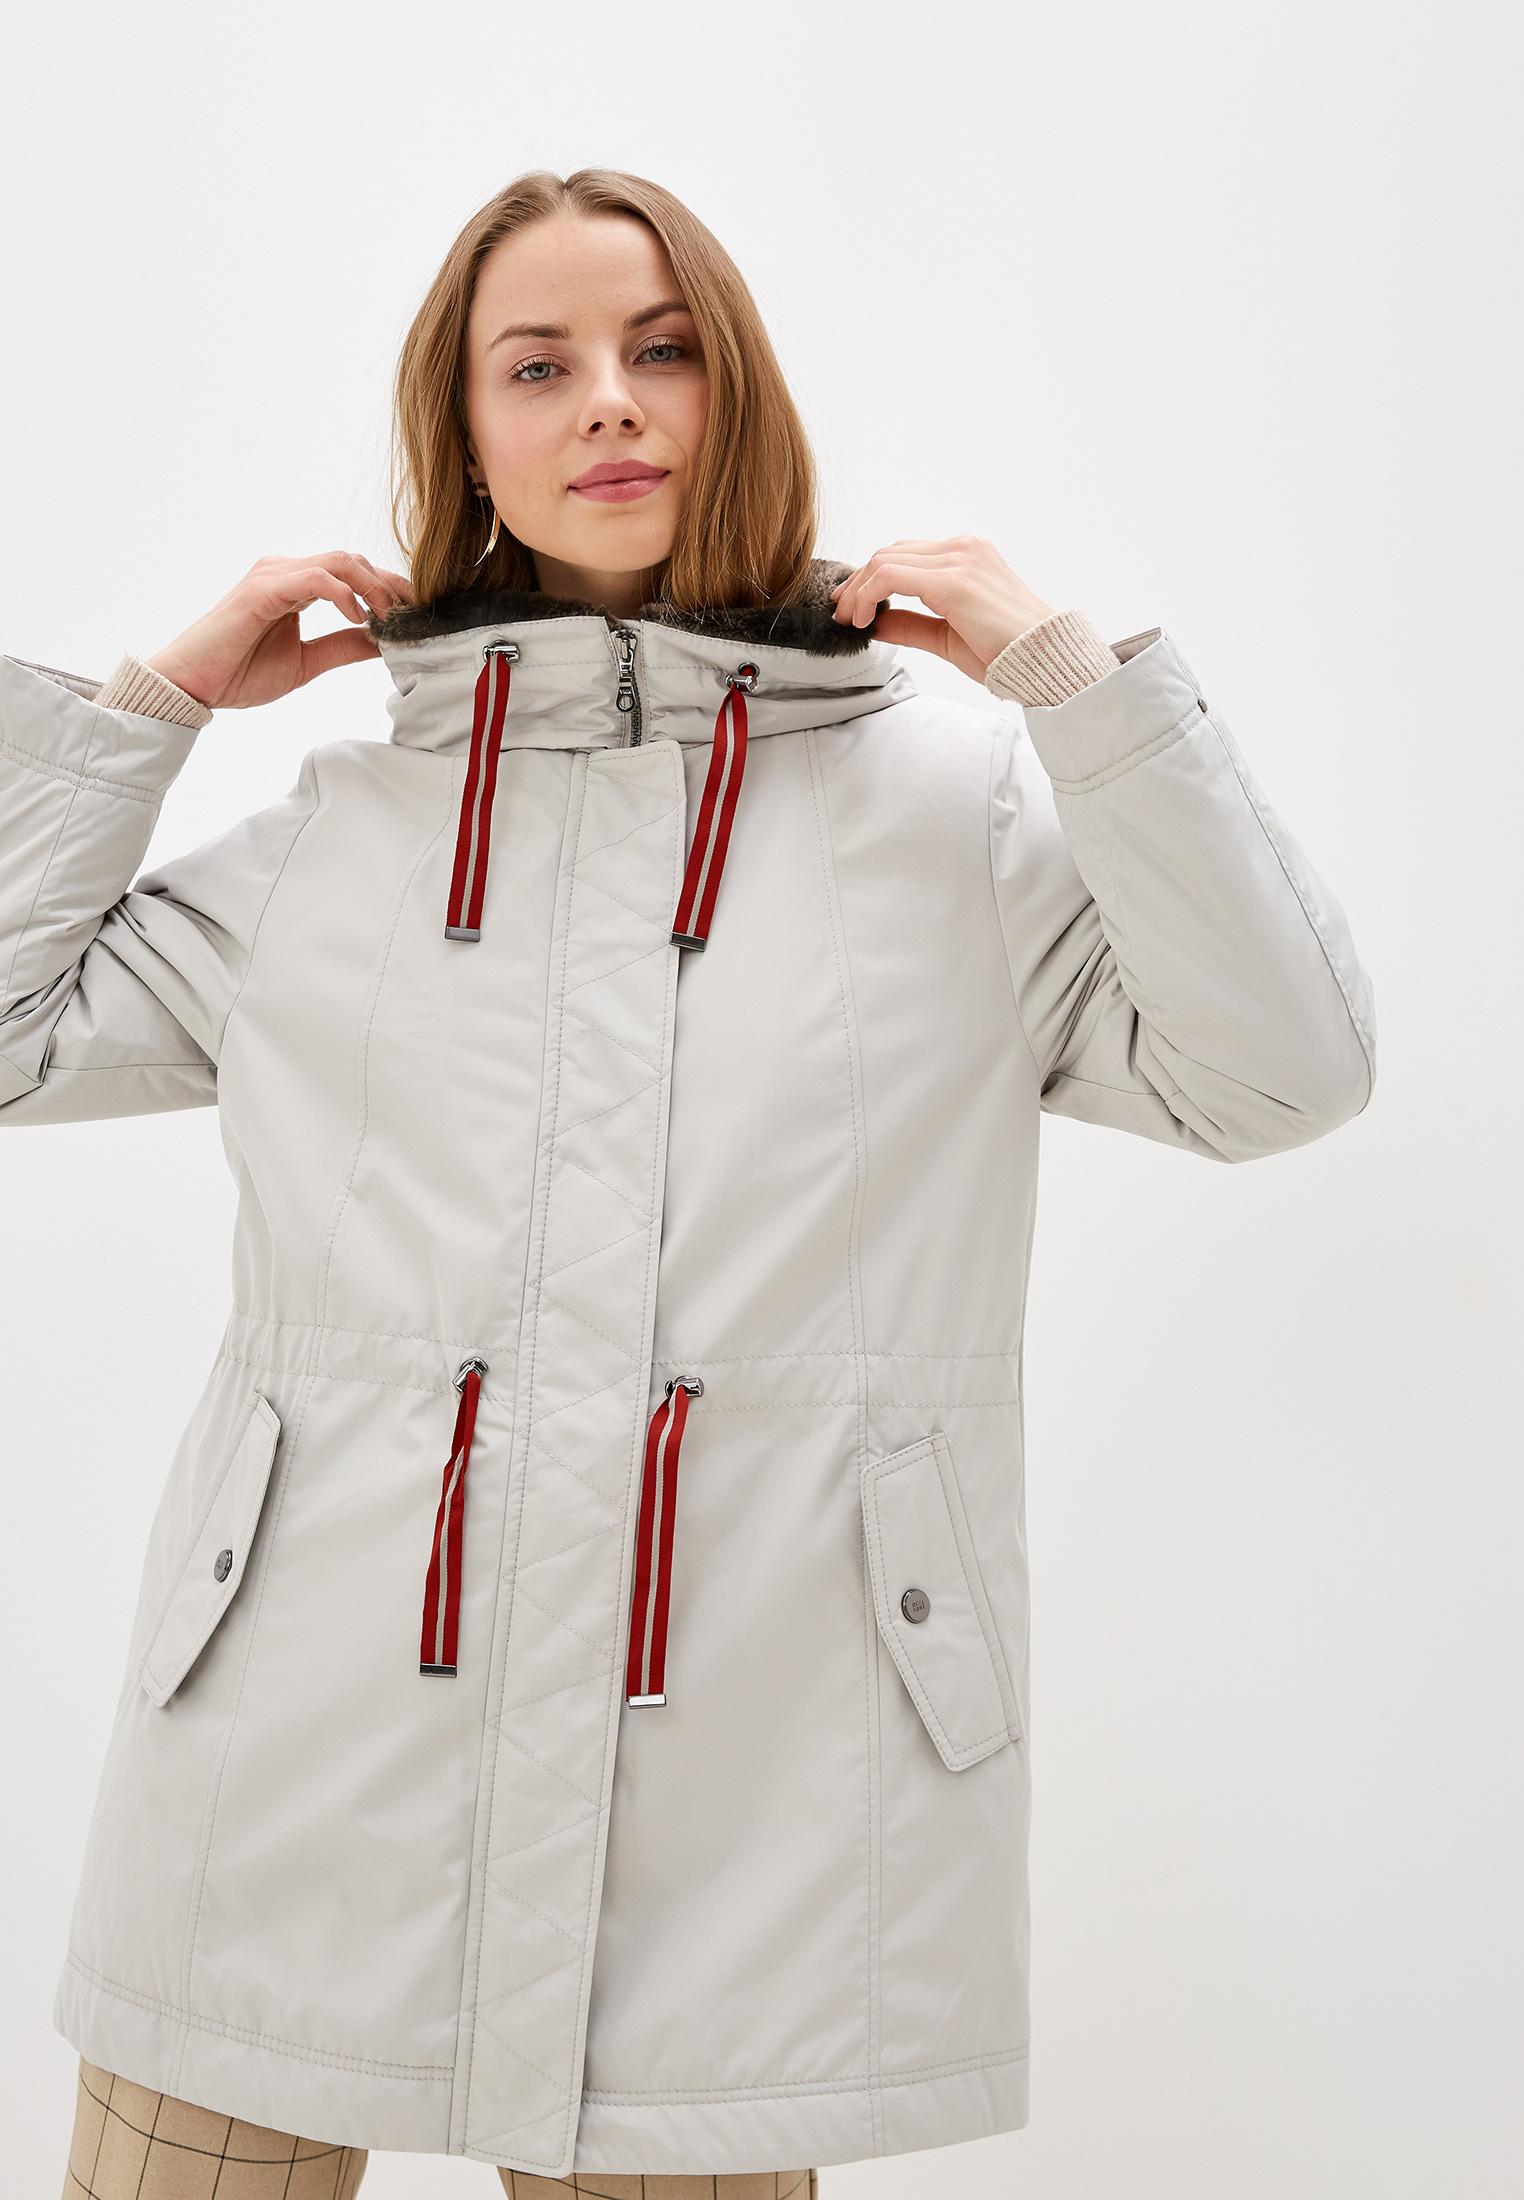 Парка, Dixi-Coat, цвет: серый. Артикул: MP002XW152CU. Одежда / Верхняя одежда